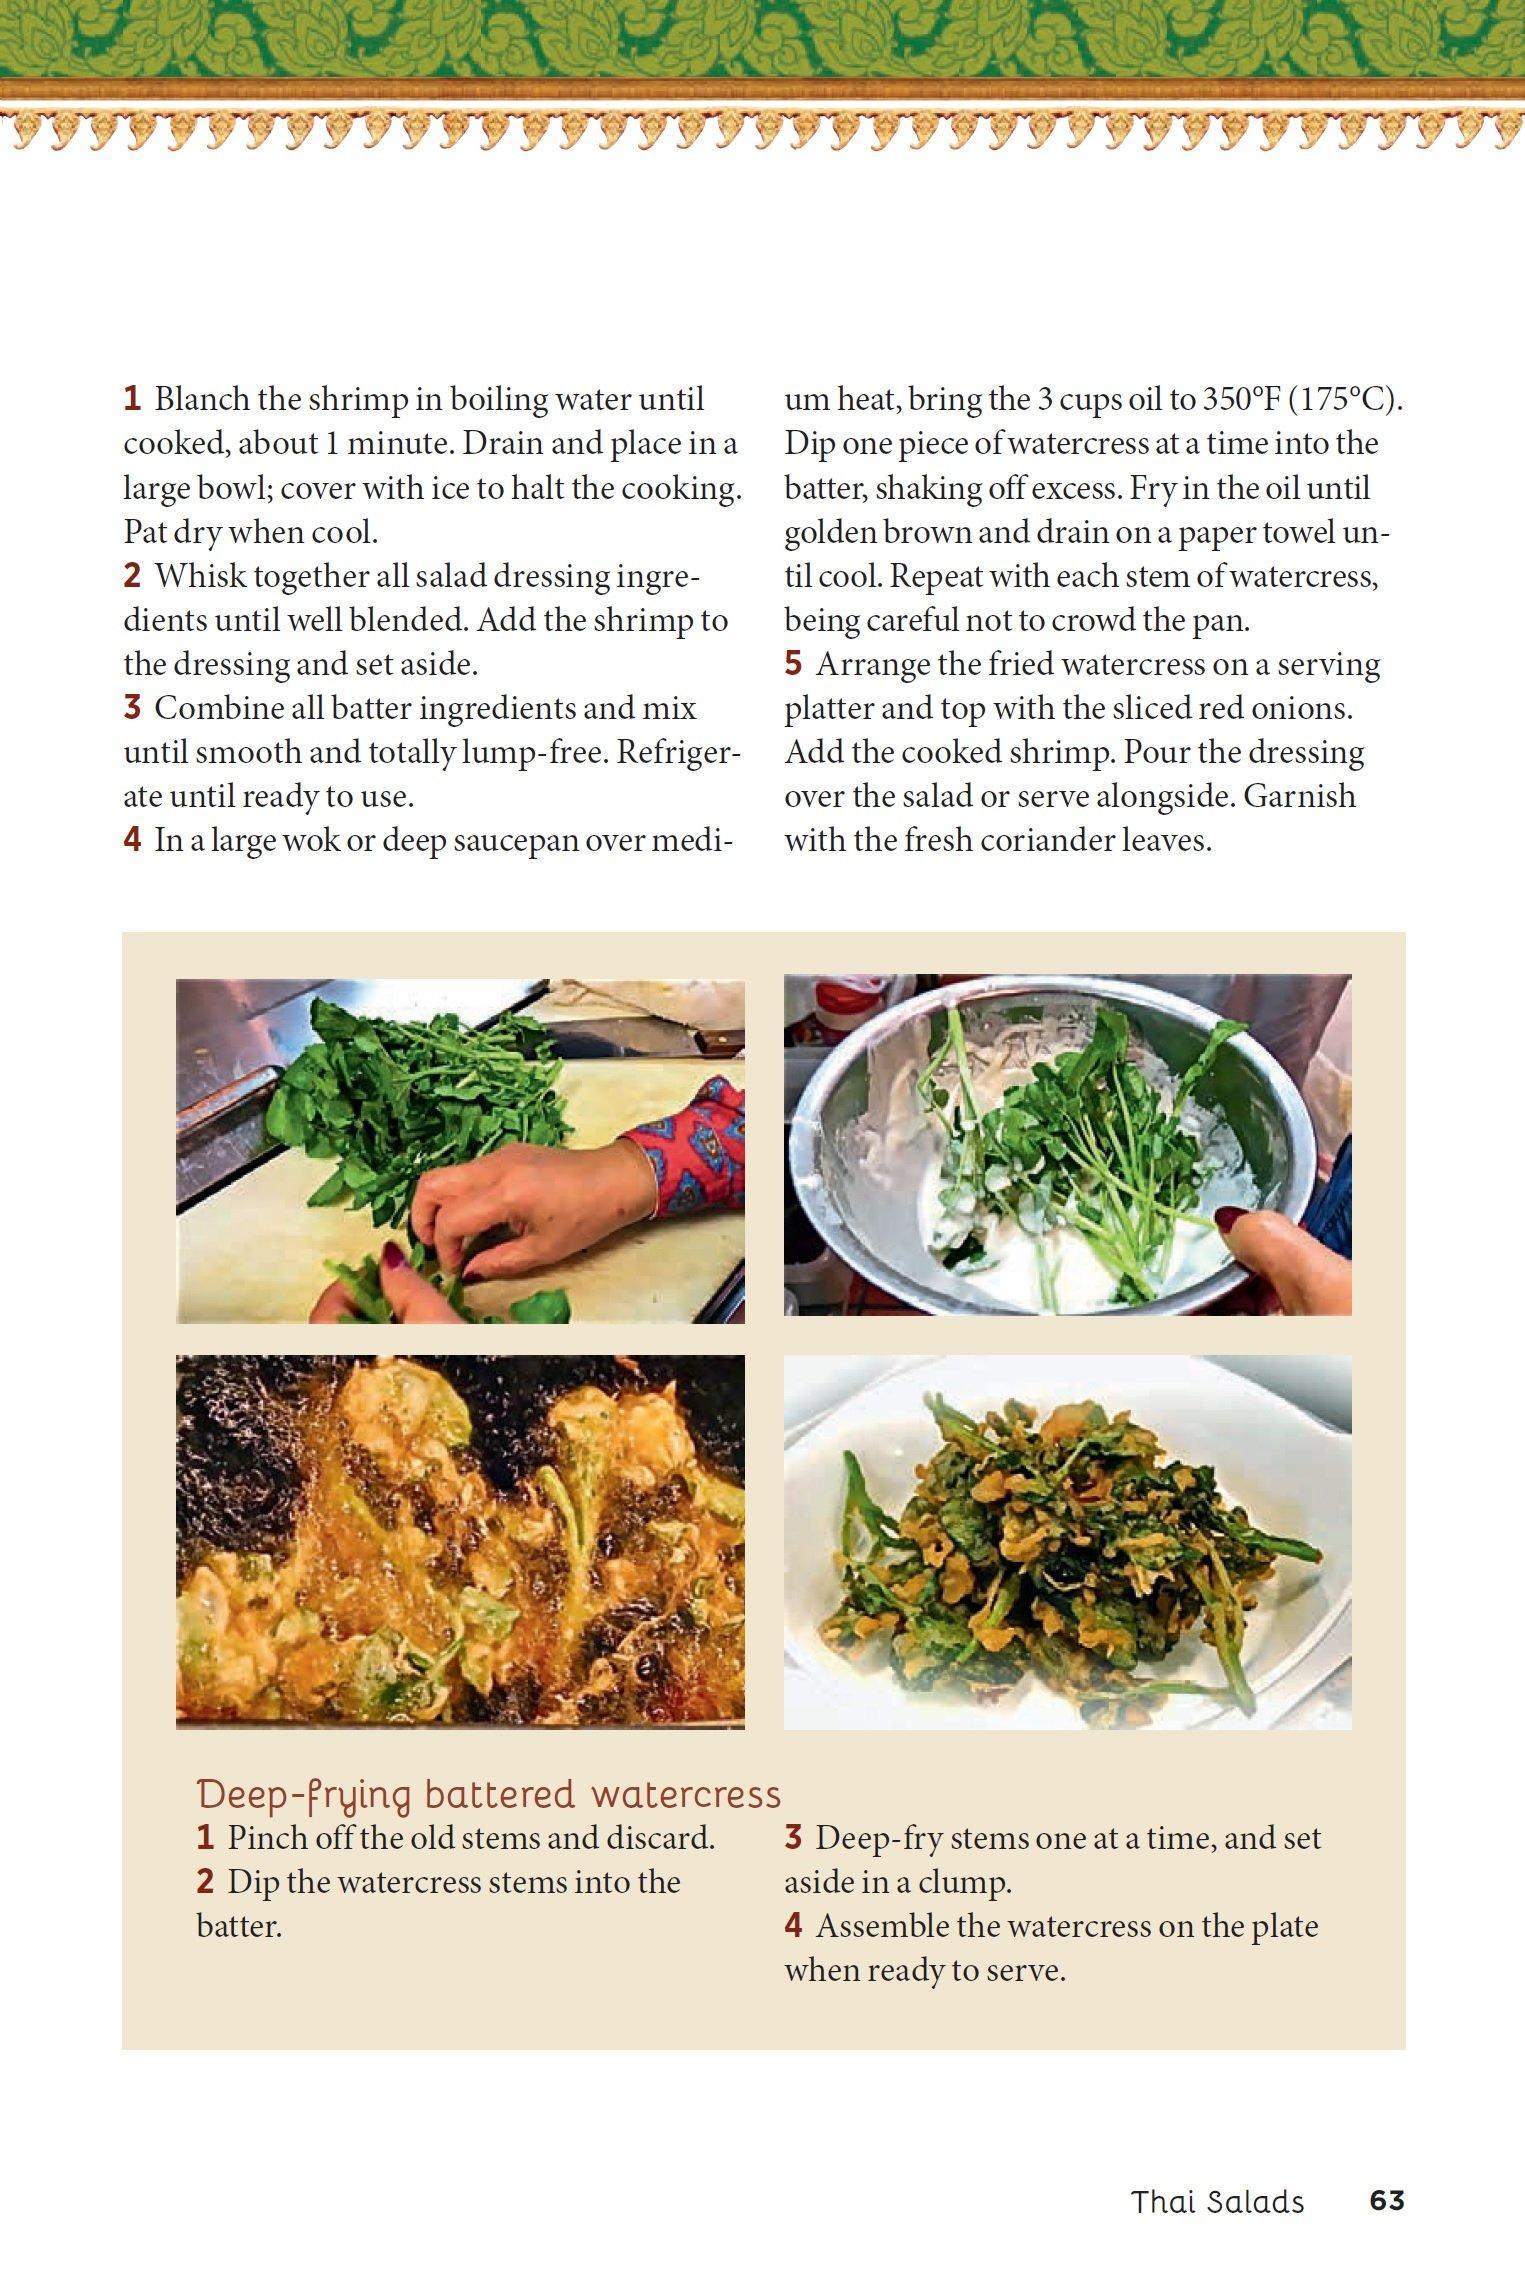 Amazon.com: Nong\'s Thai Kitchen: 84 Classic Recipes that are Quick ...